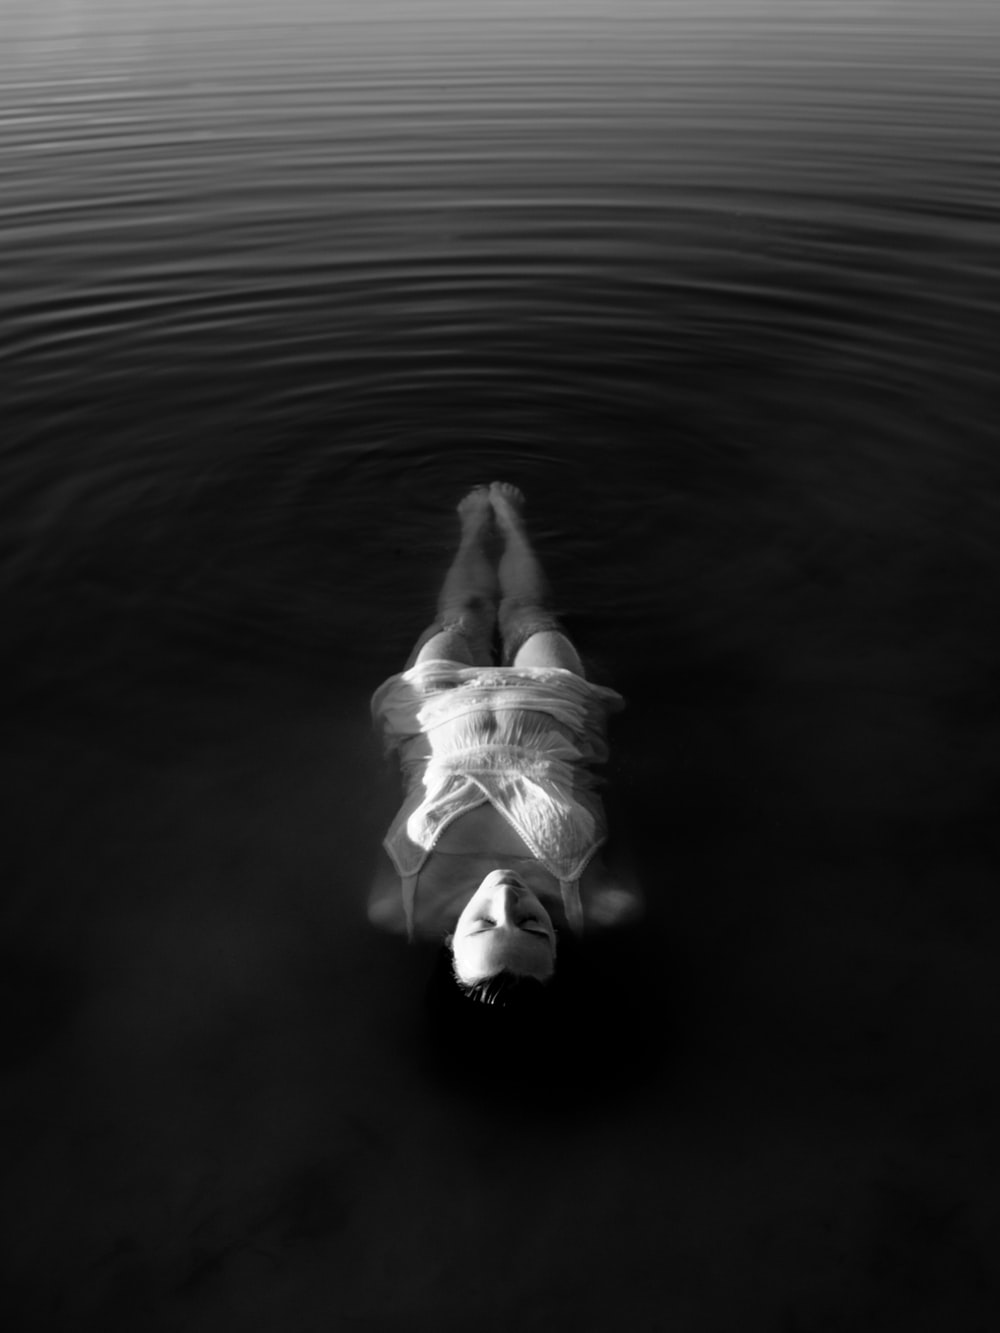 woman wearing white spaghetti-strap top near body of water